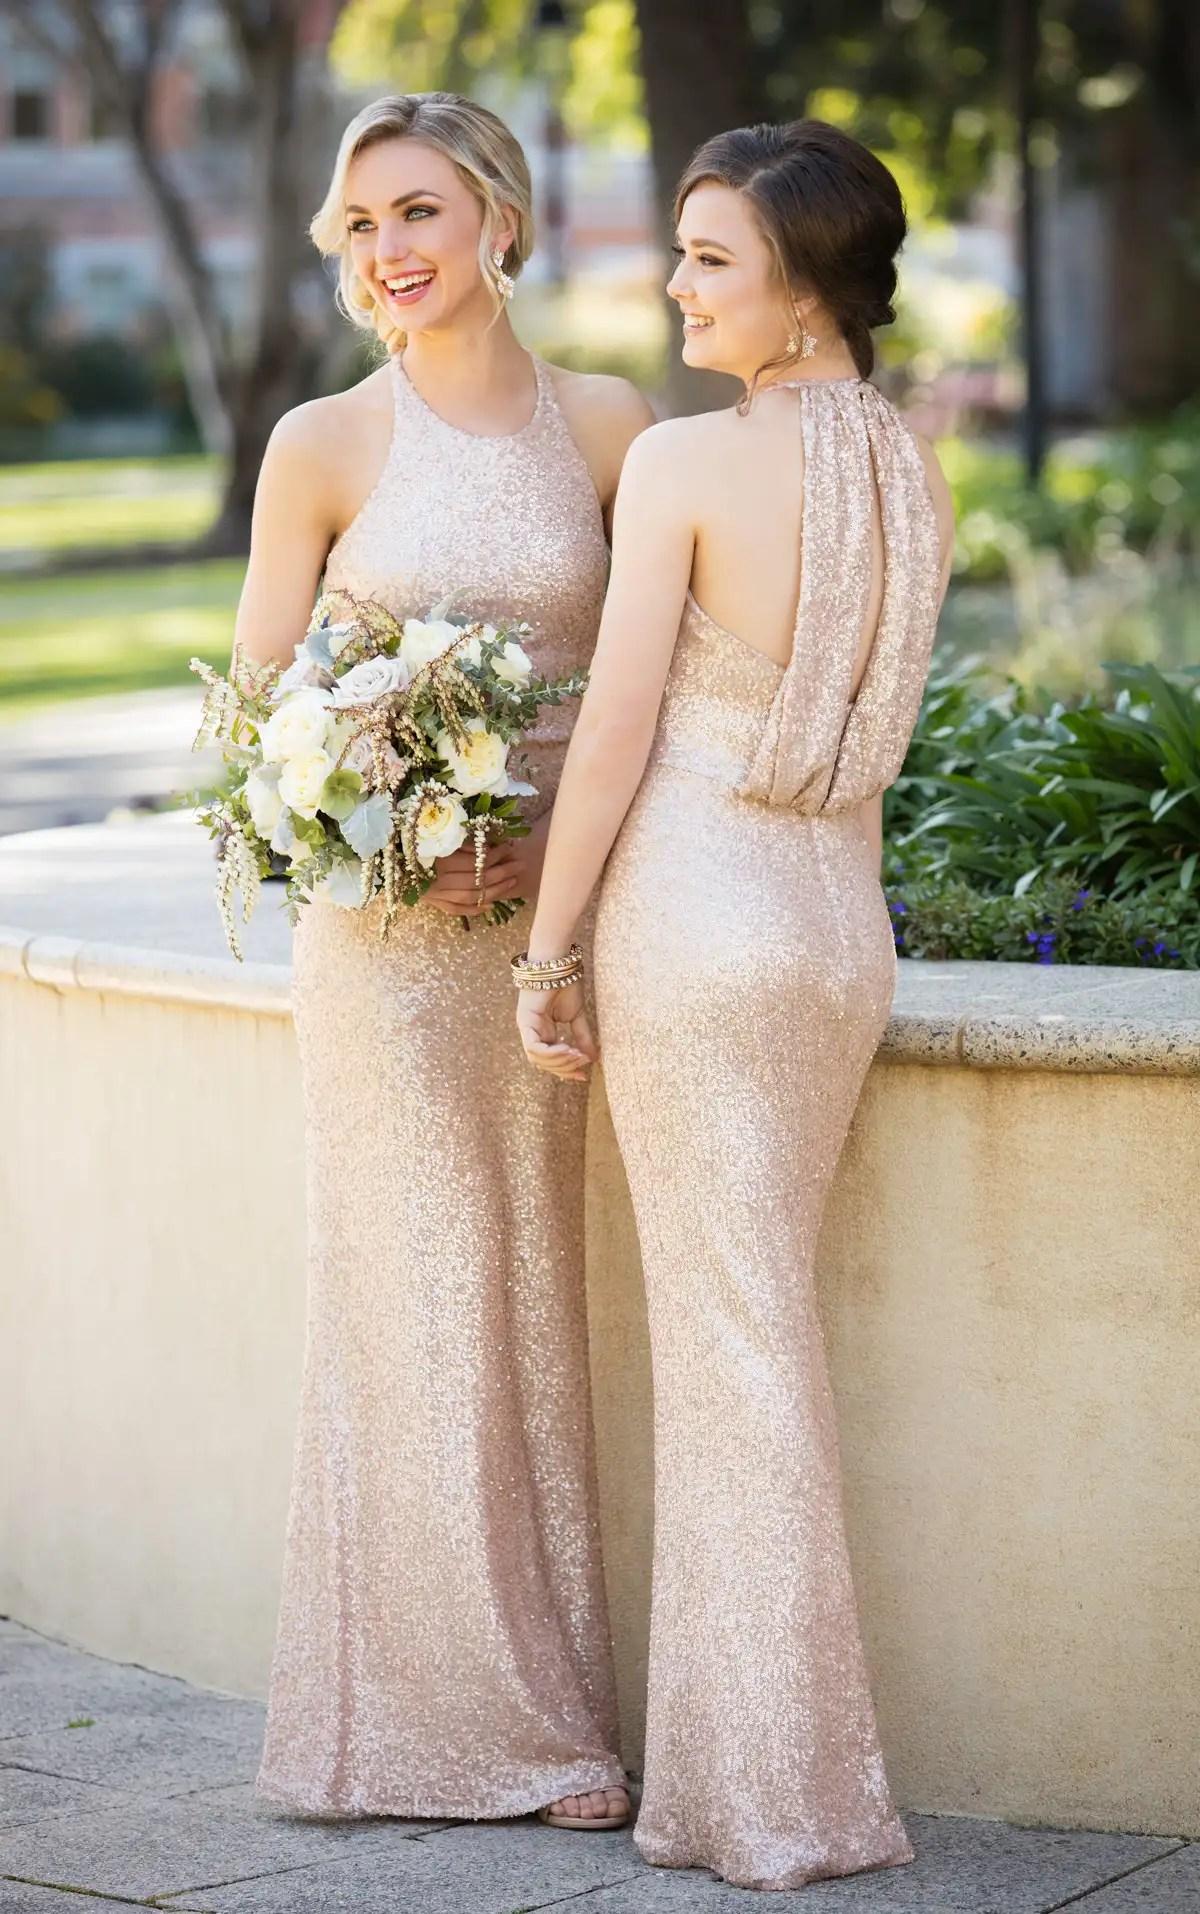 Bridesmaid Dresses  HighNeck Sequin Bridesmaid Gown  Sorella Vita